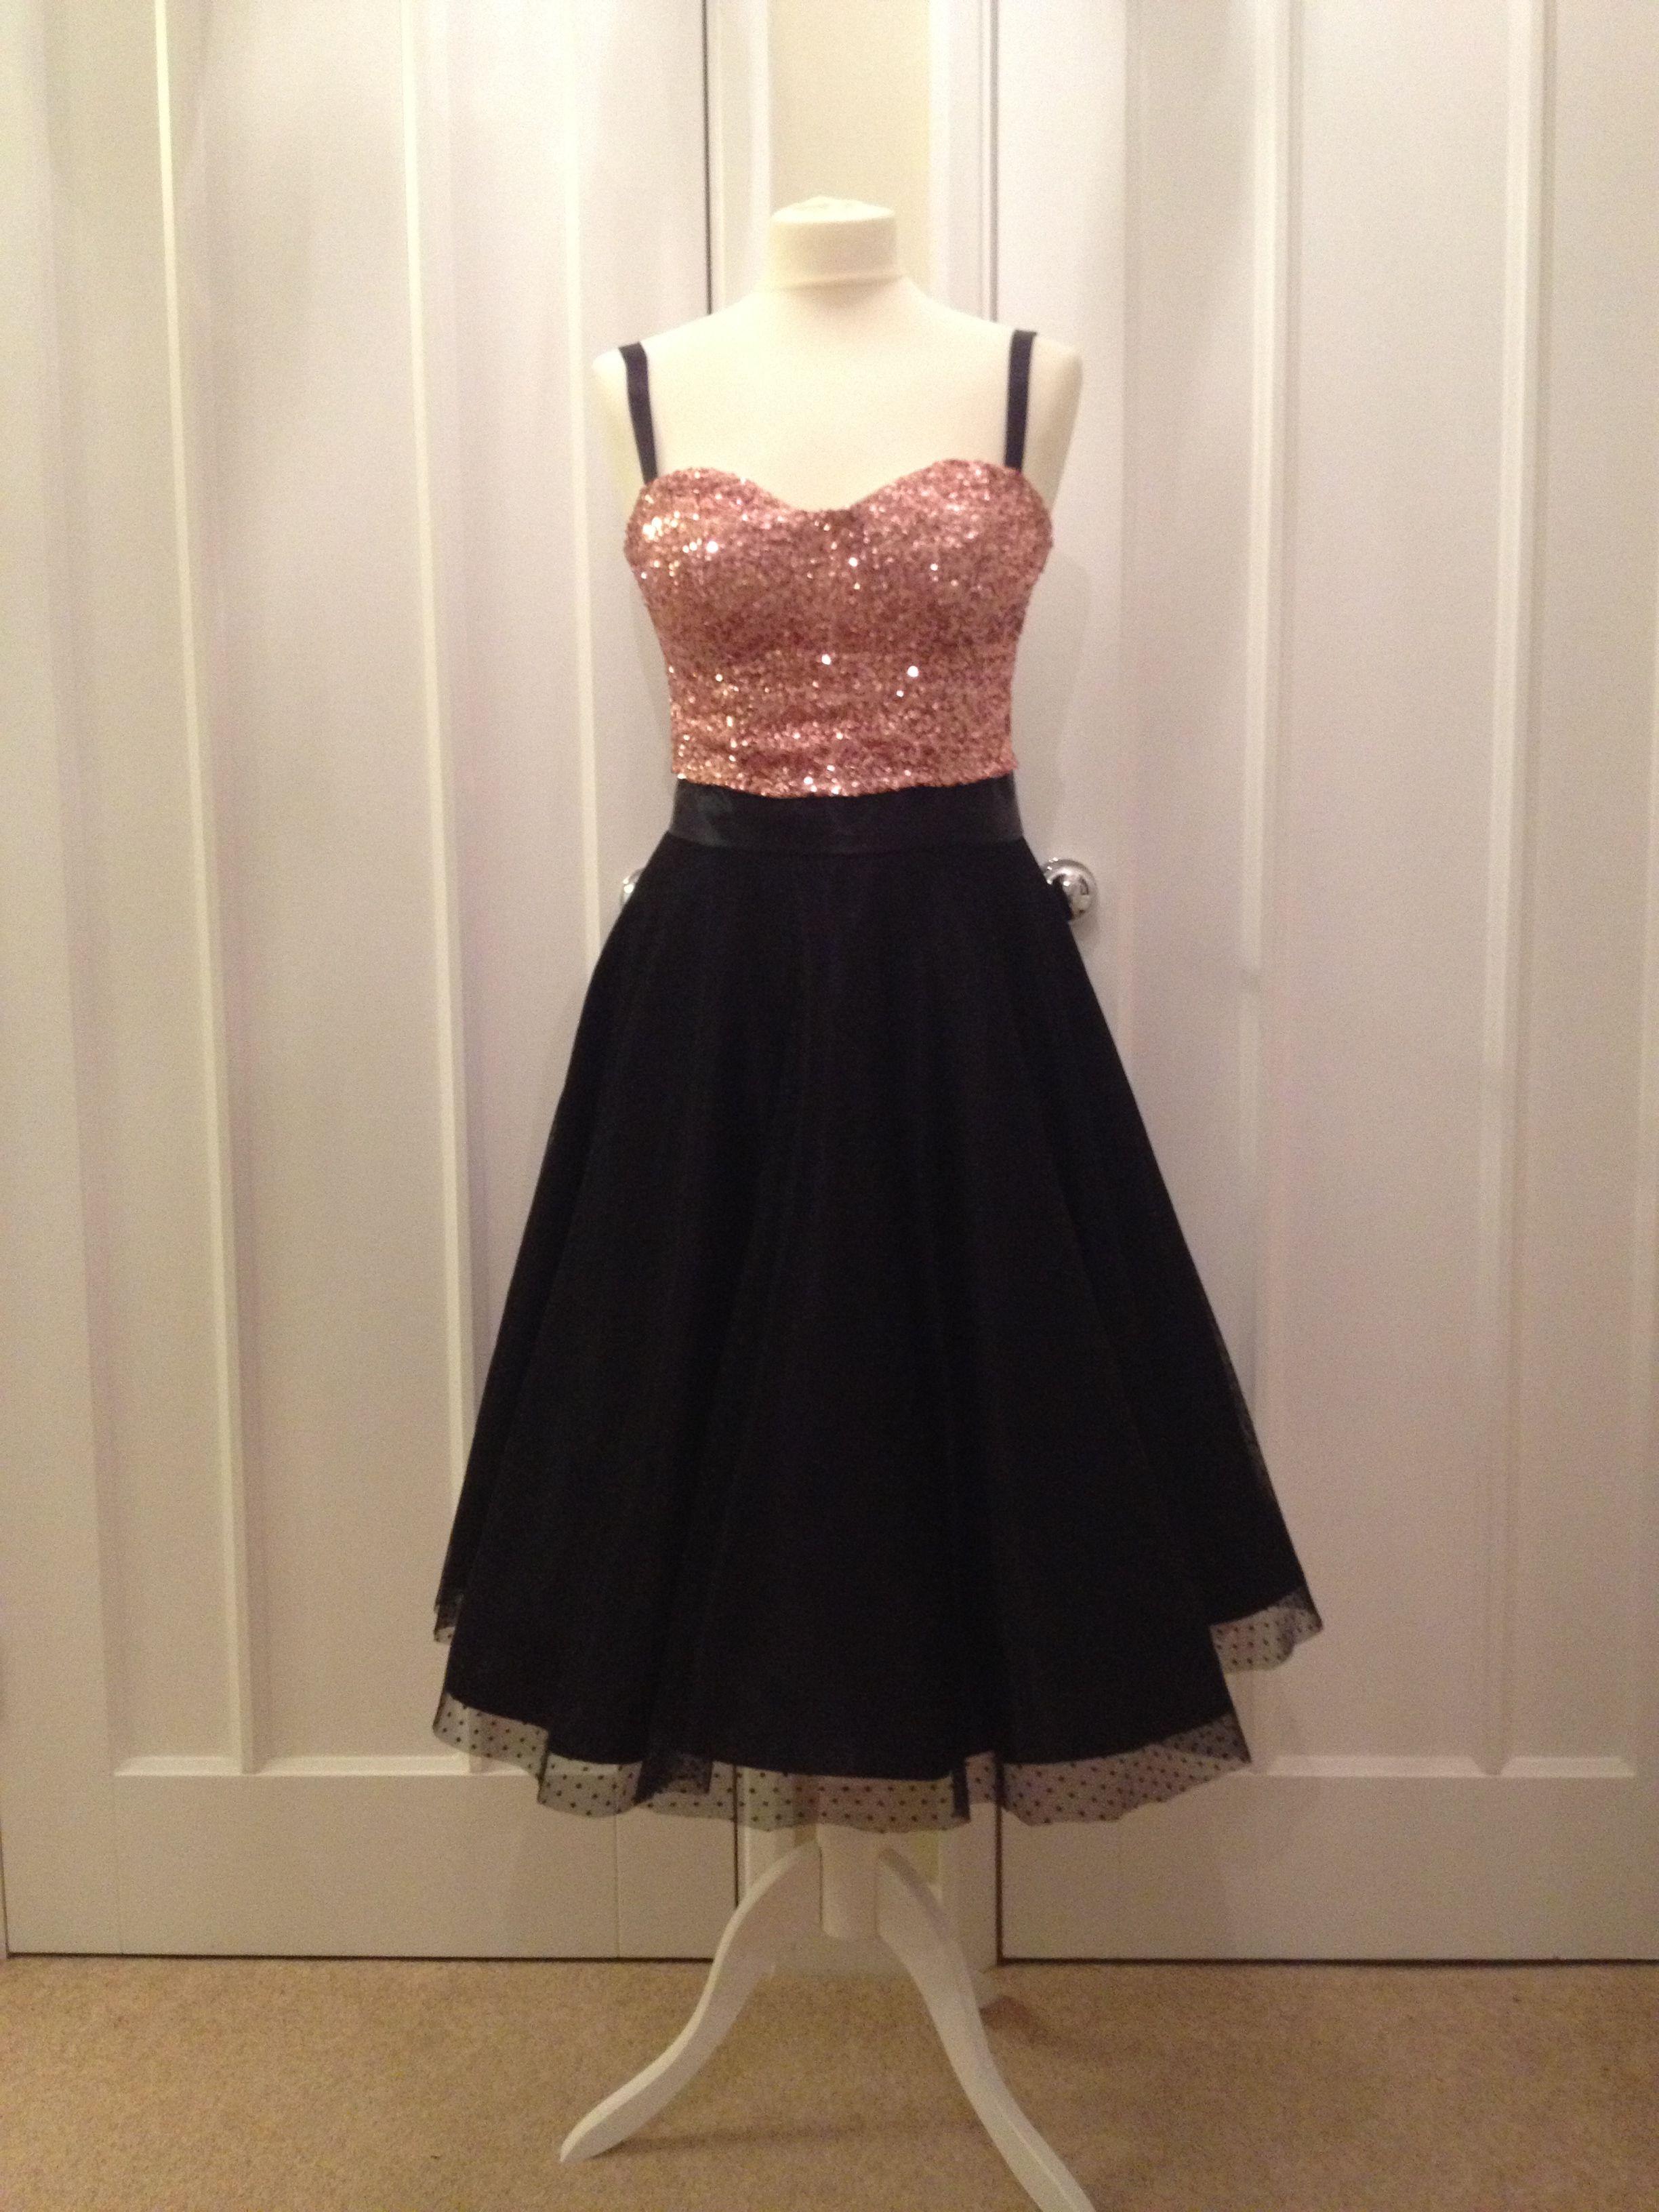 f7e9e85b6e Homemade (DIY) cocktail dress- pink sequin top attached to a black circle  skirt